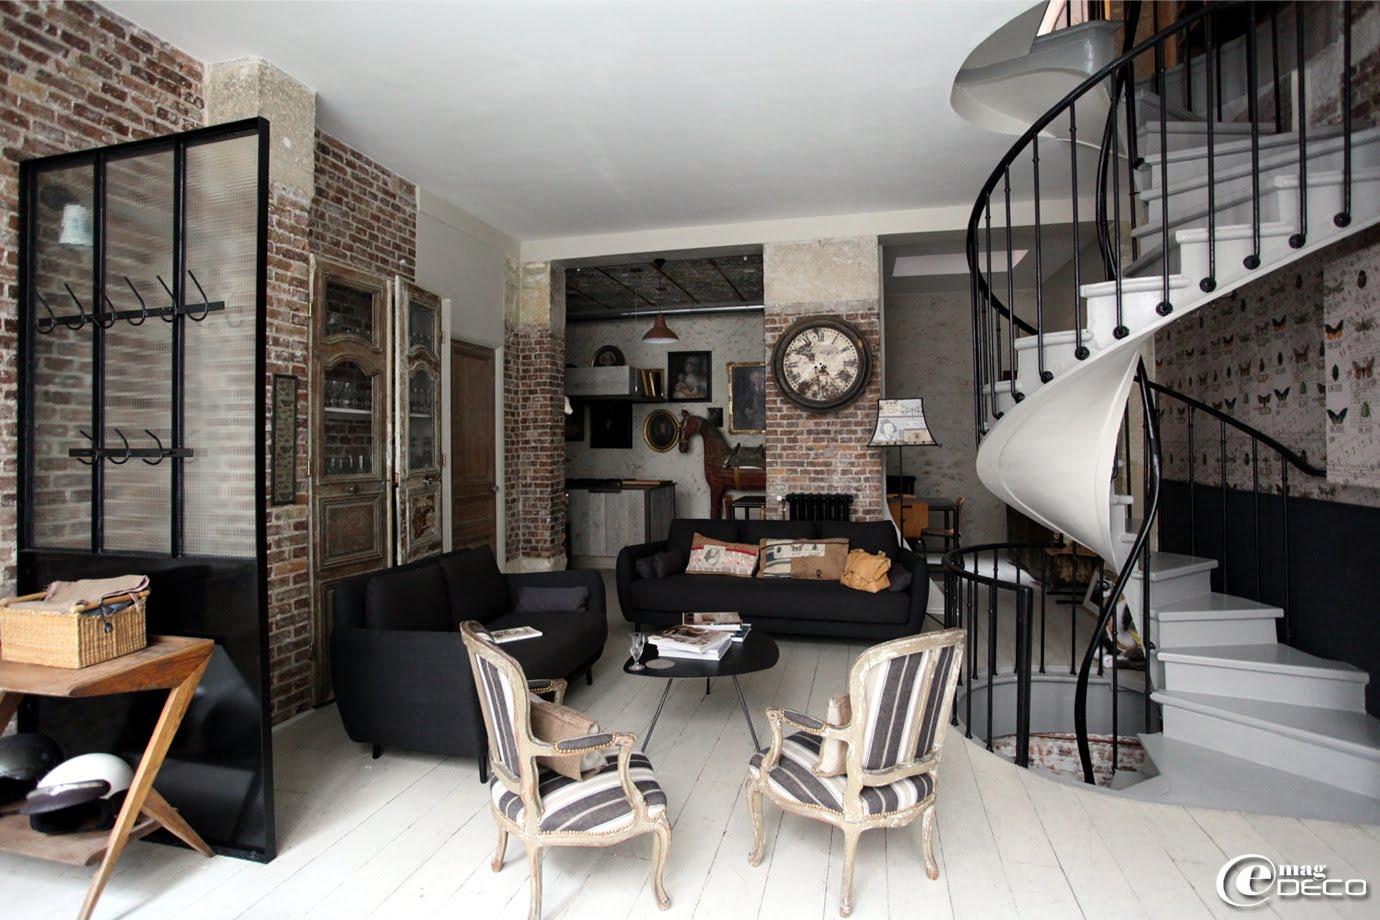 Chambre ado garcon style industriel for Model de decoration interieur